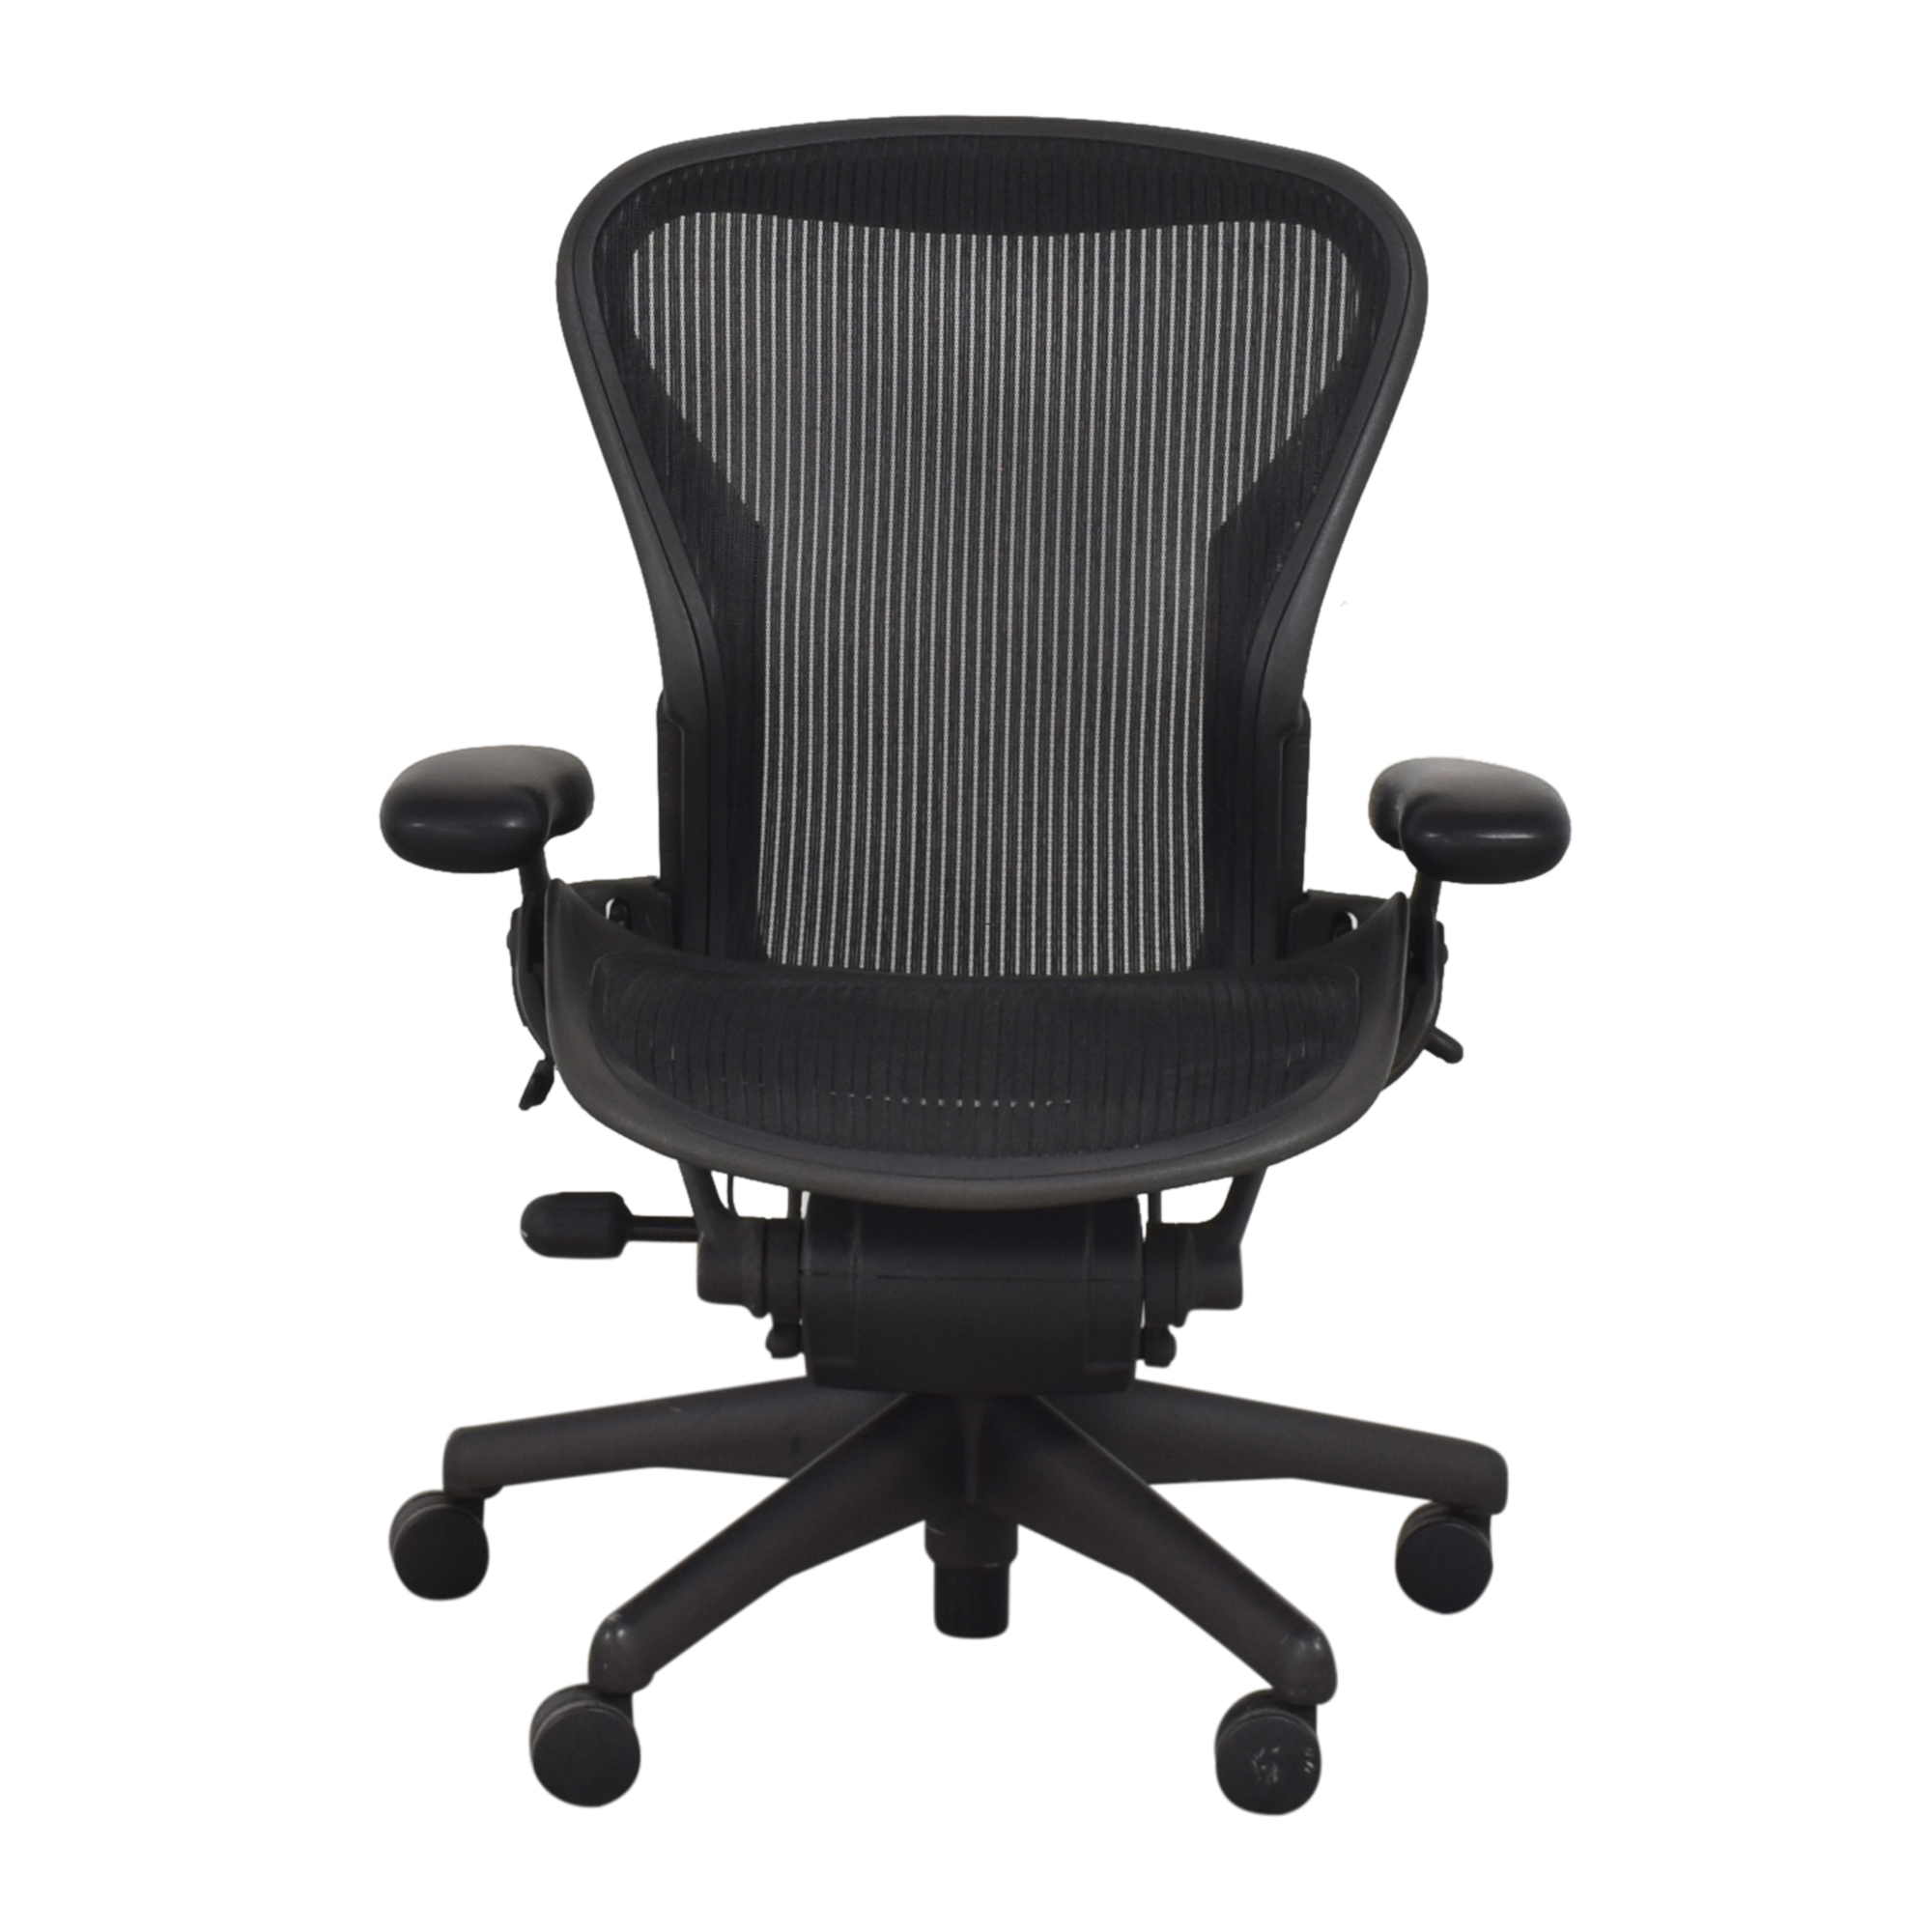 Herman Miller Aeron Size B Swivel Desk Chair / Chairs